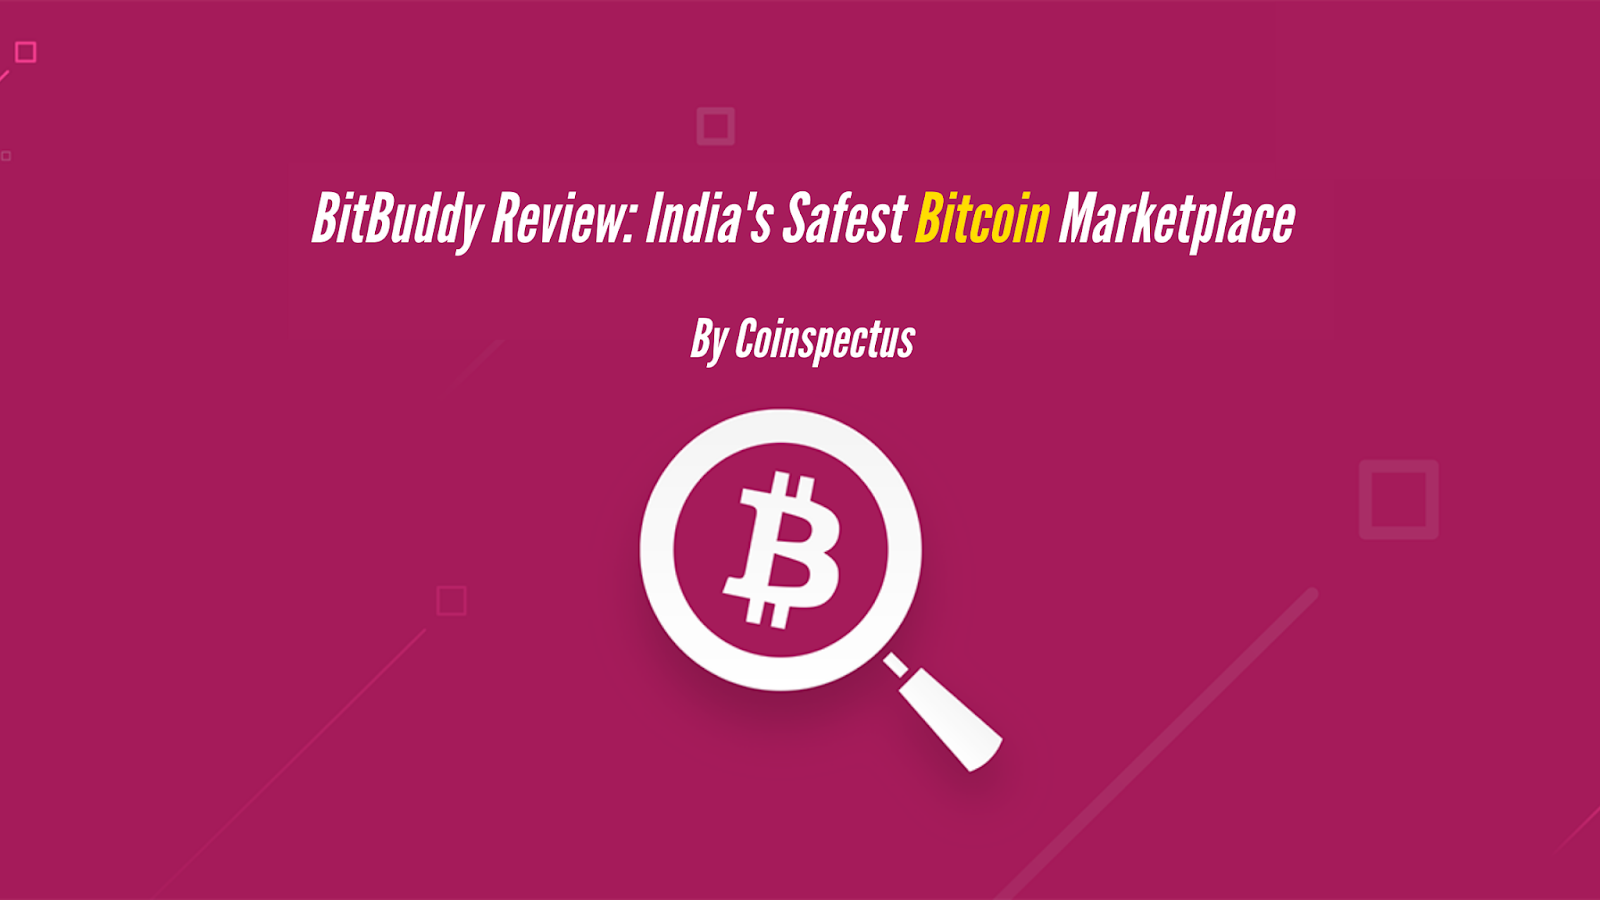 BitBuddy India's Safest Bitcoin Marketplace